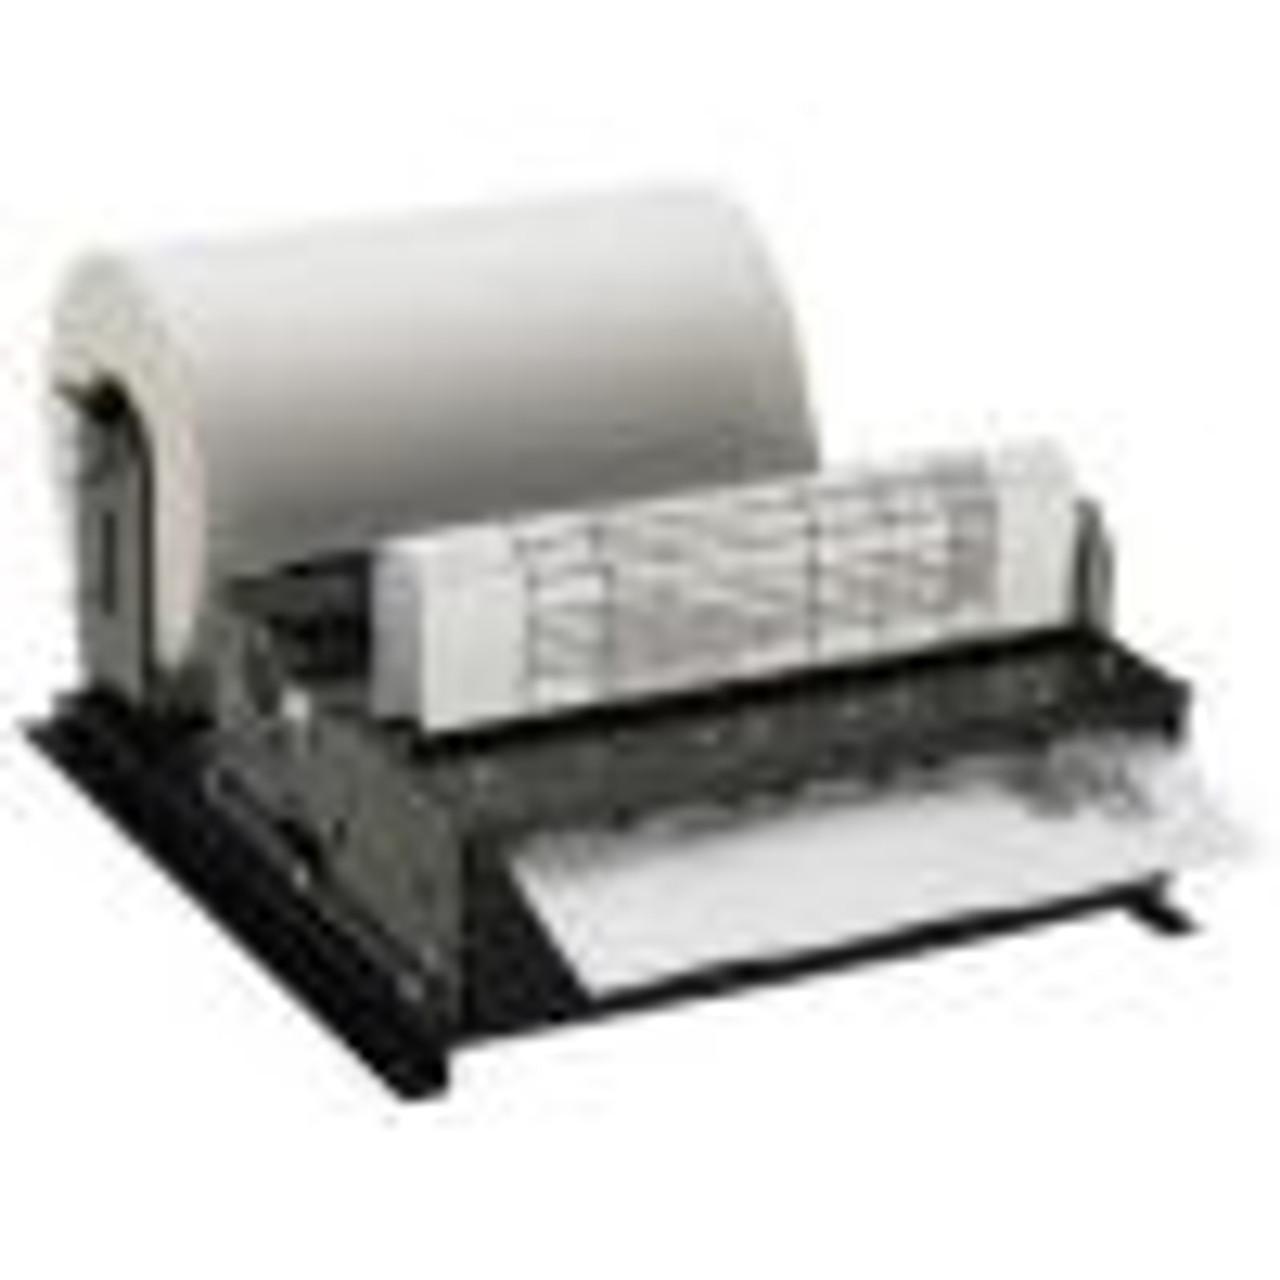 TTP 2110 Printers